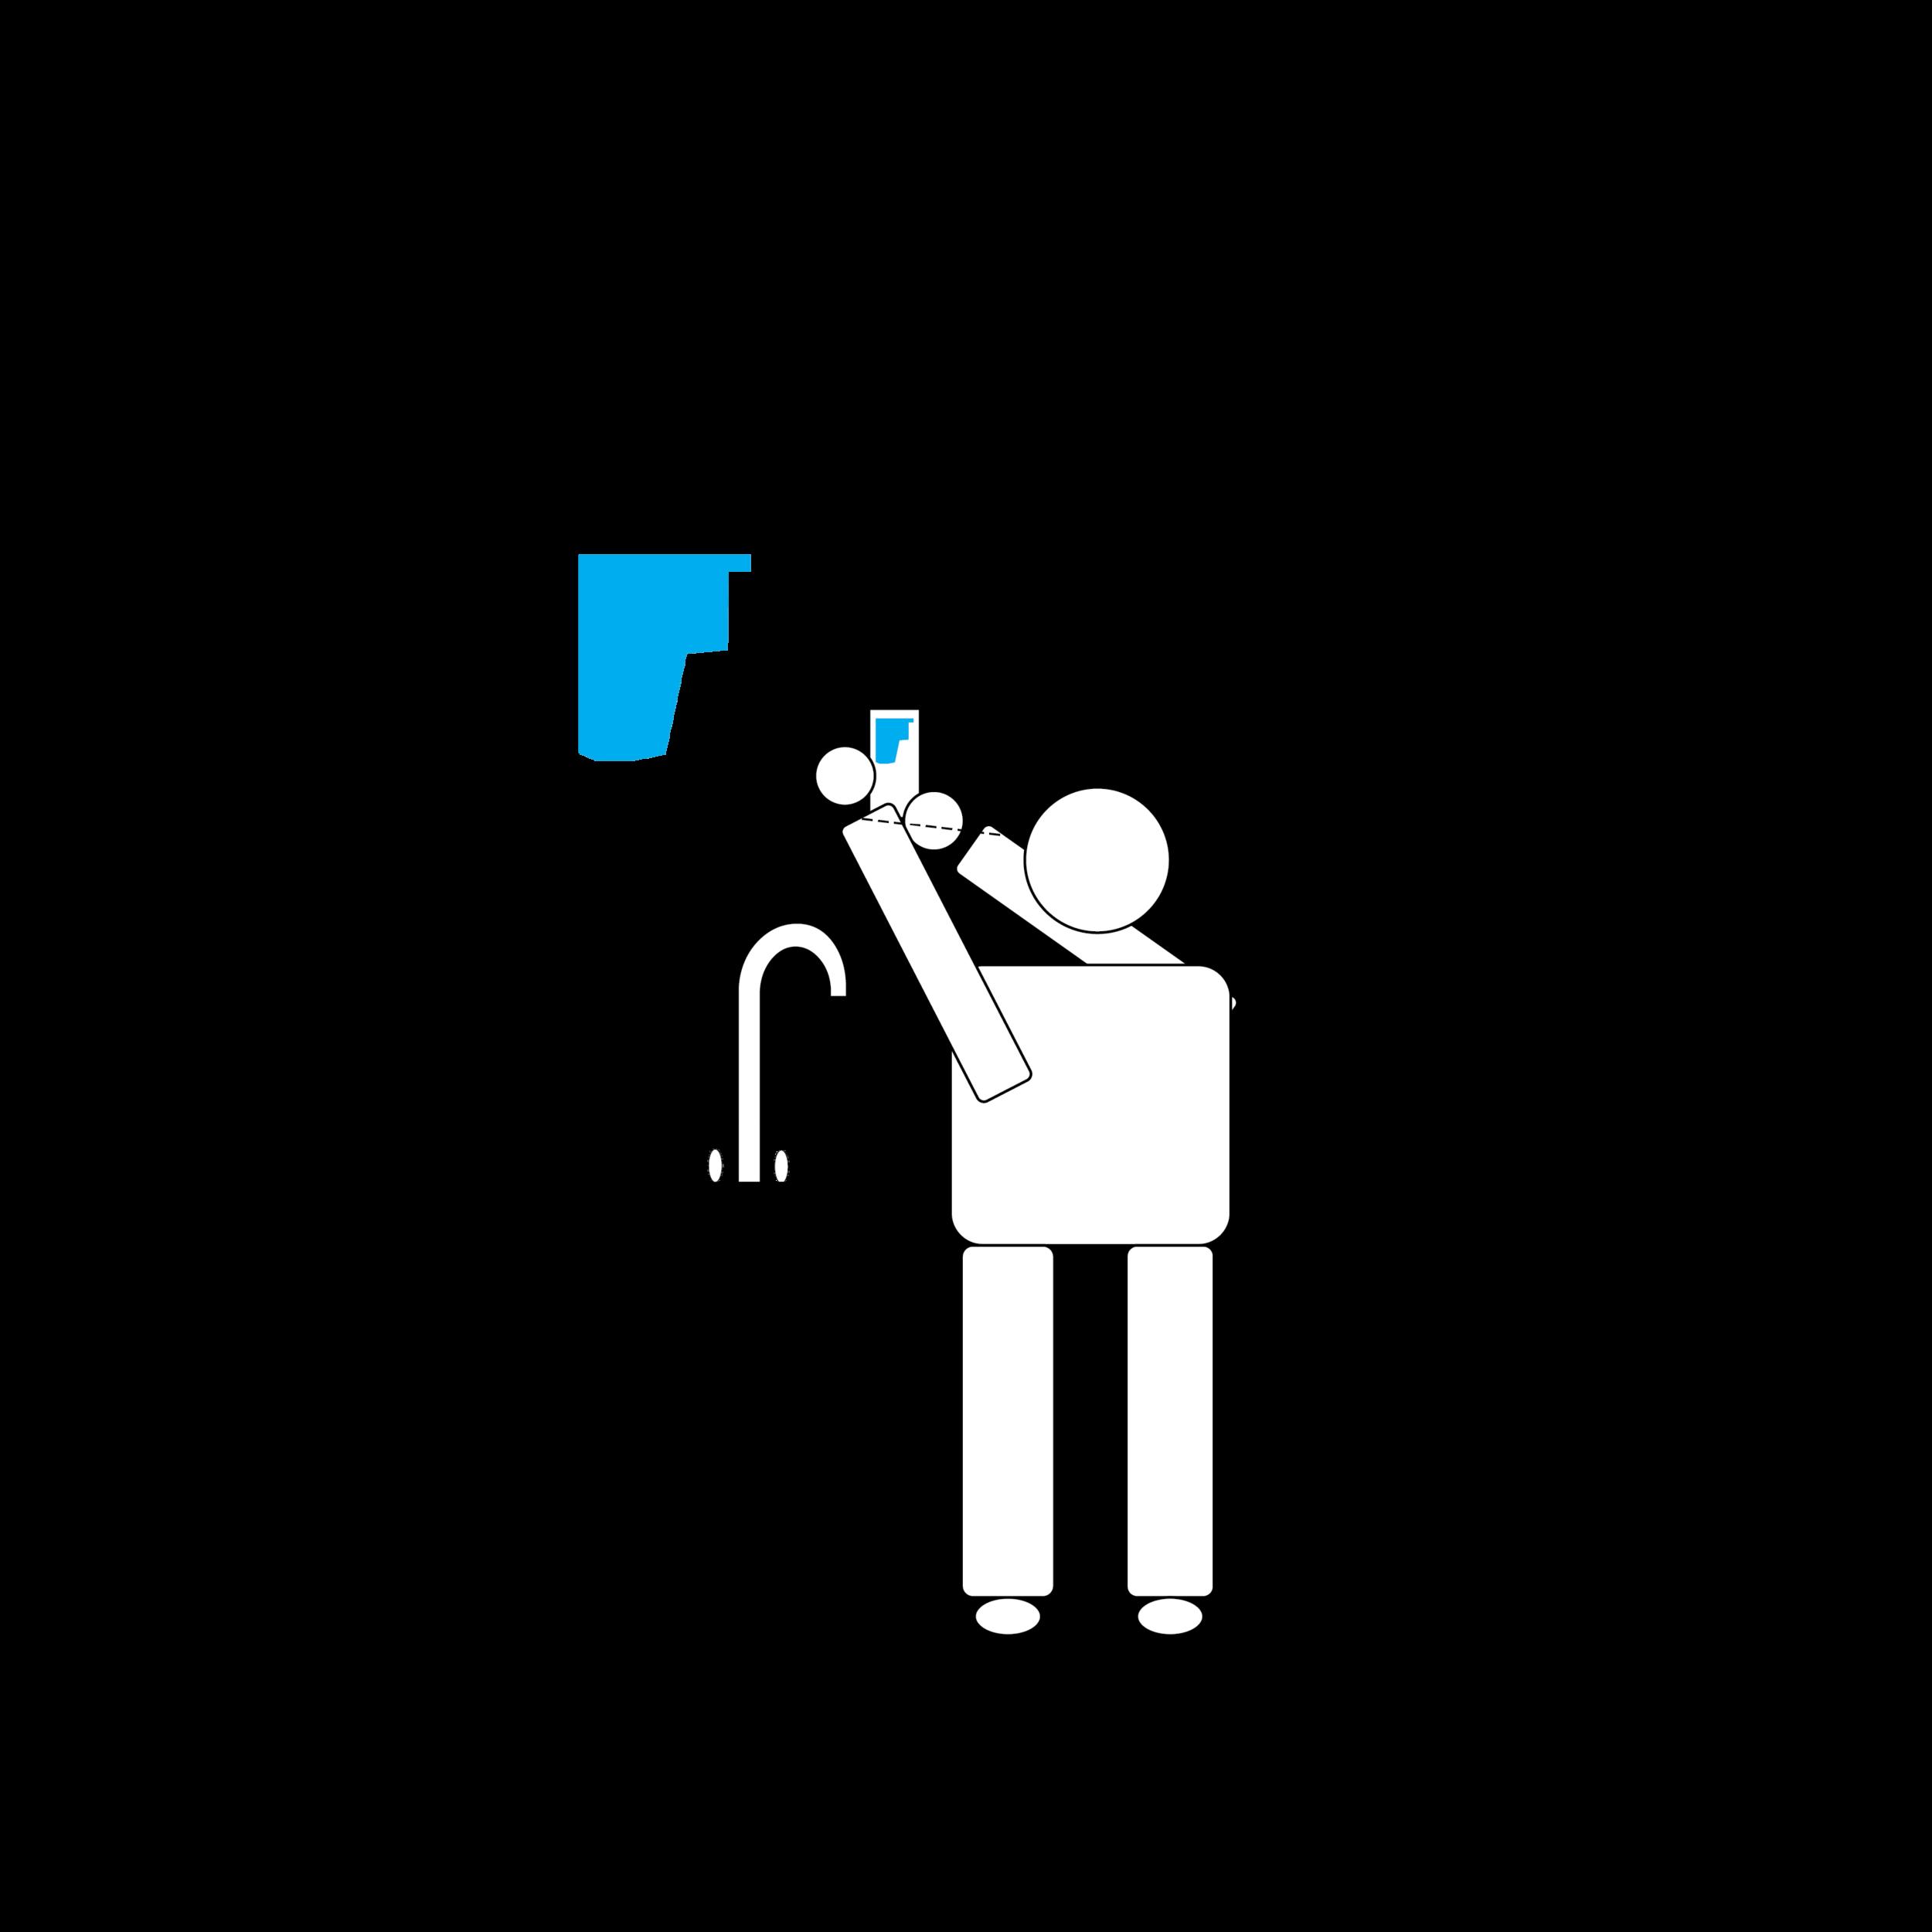 skyshapes-diagram-step3.png